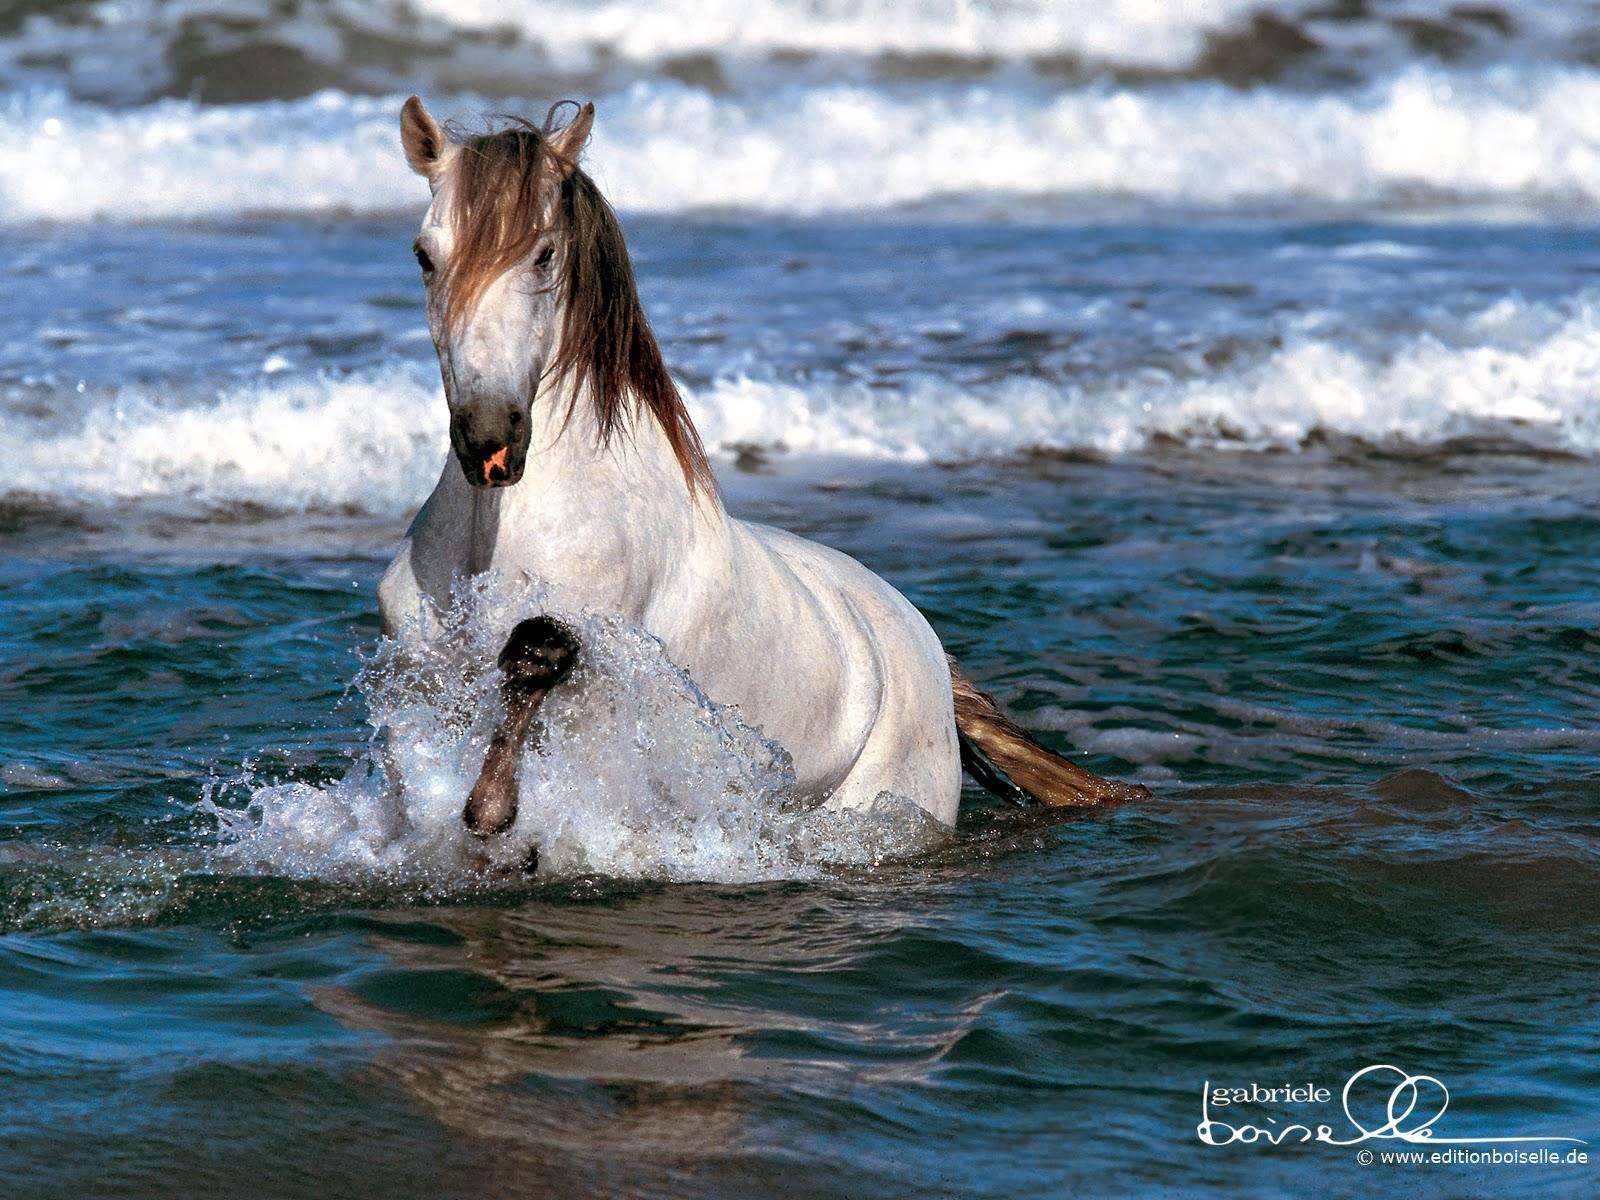 Popular   Wallpaper Horse Epic - Horse+HD+Funny+Wallpapers+07  Image_604334.jpg